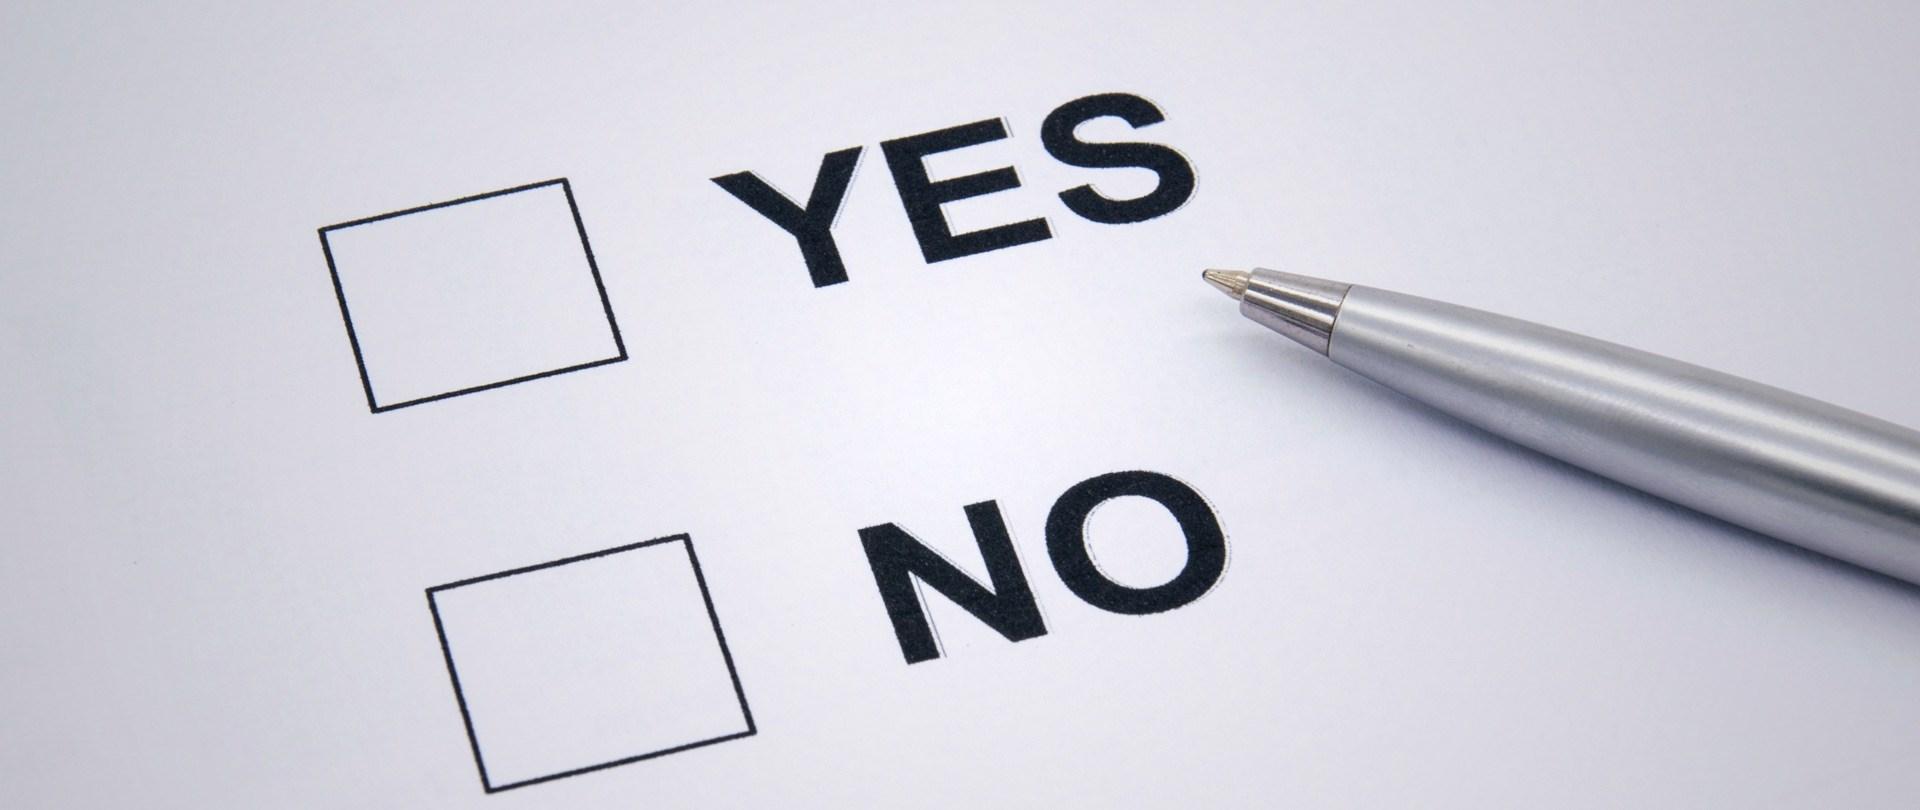 Do surveys count as a qualitative research method?